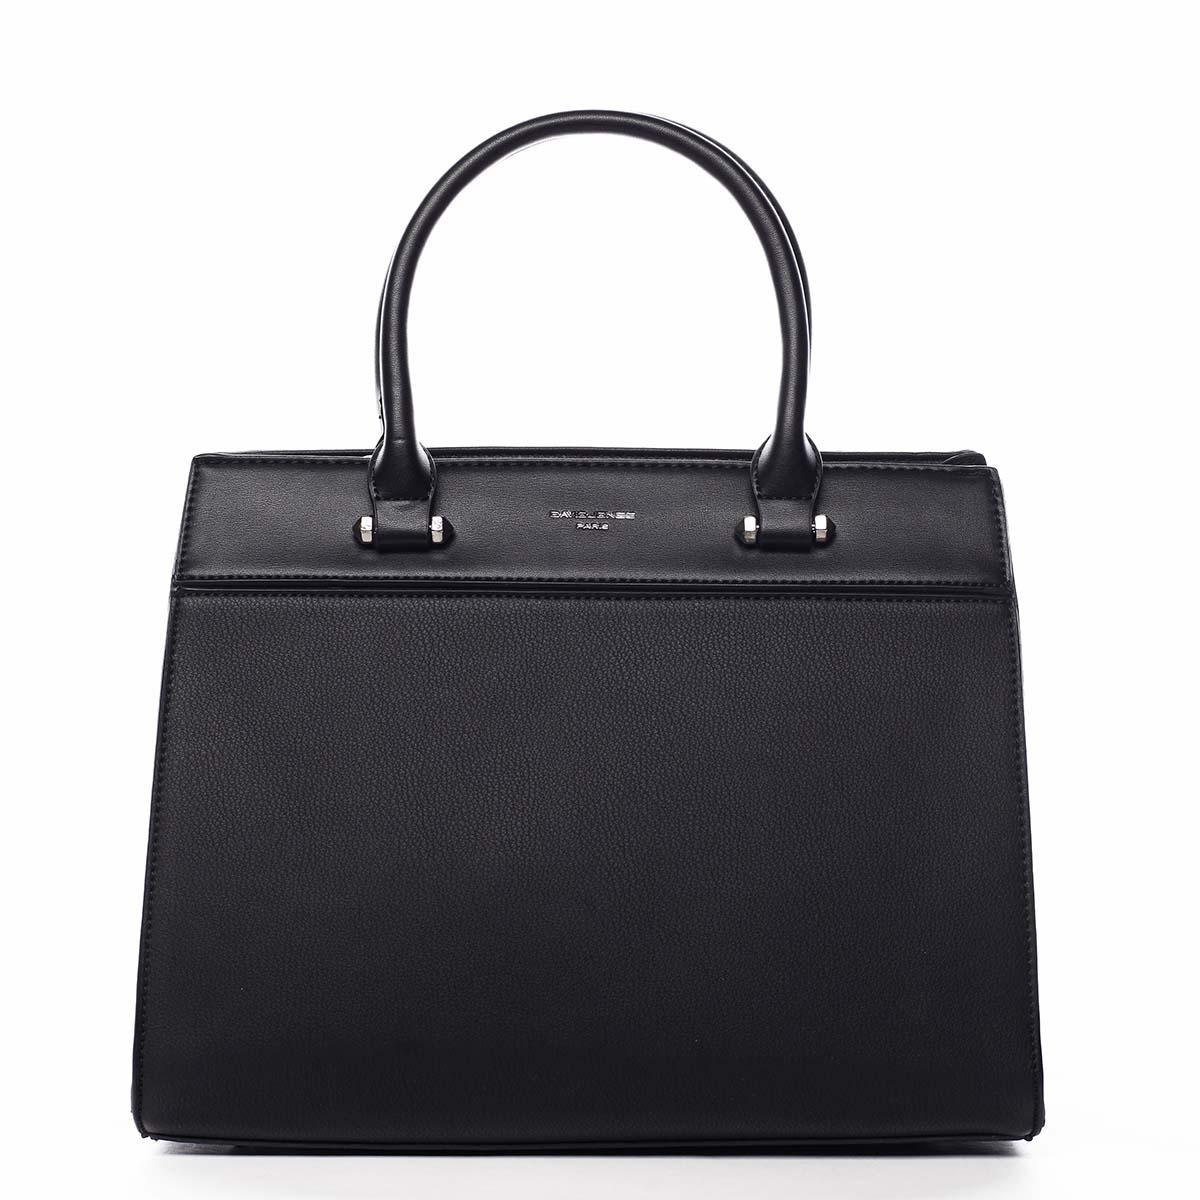 Dámská kabelka do ruky černá - David Jones Tenerwa